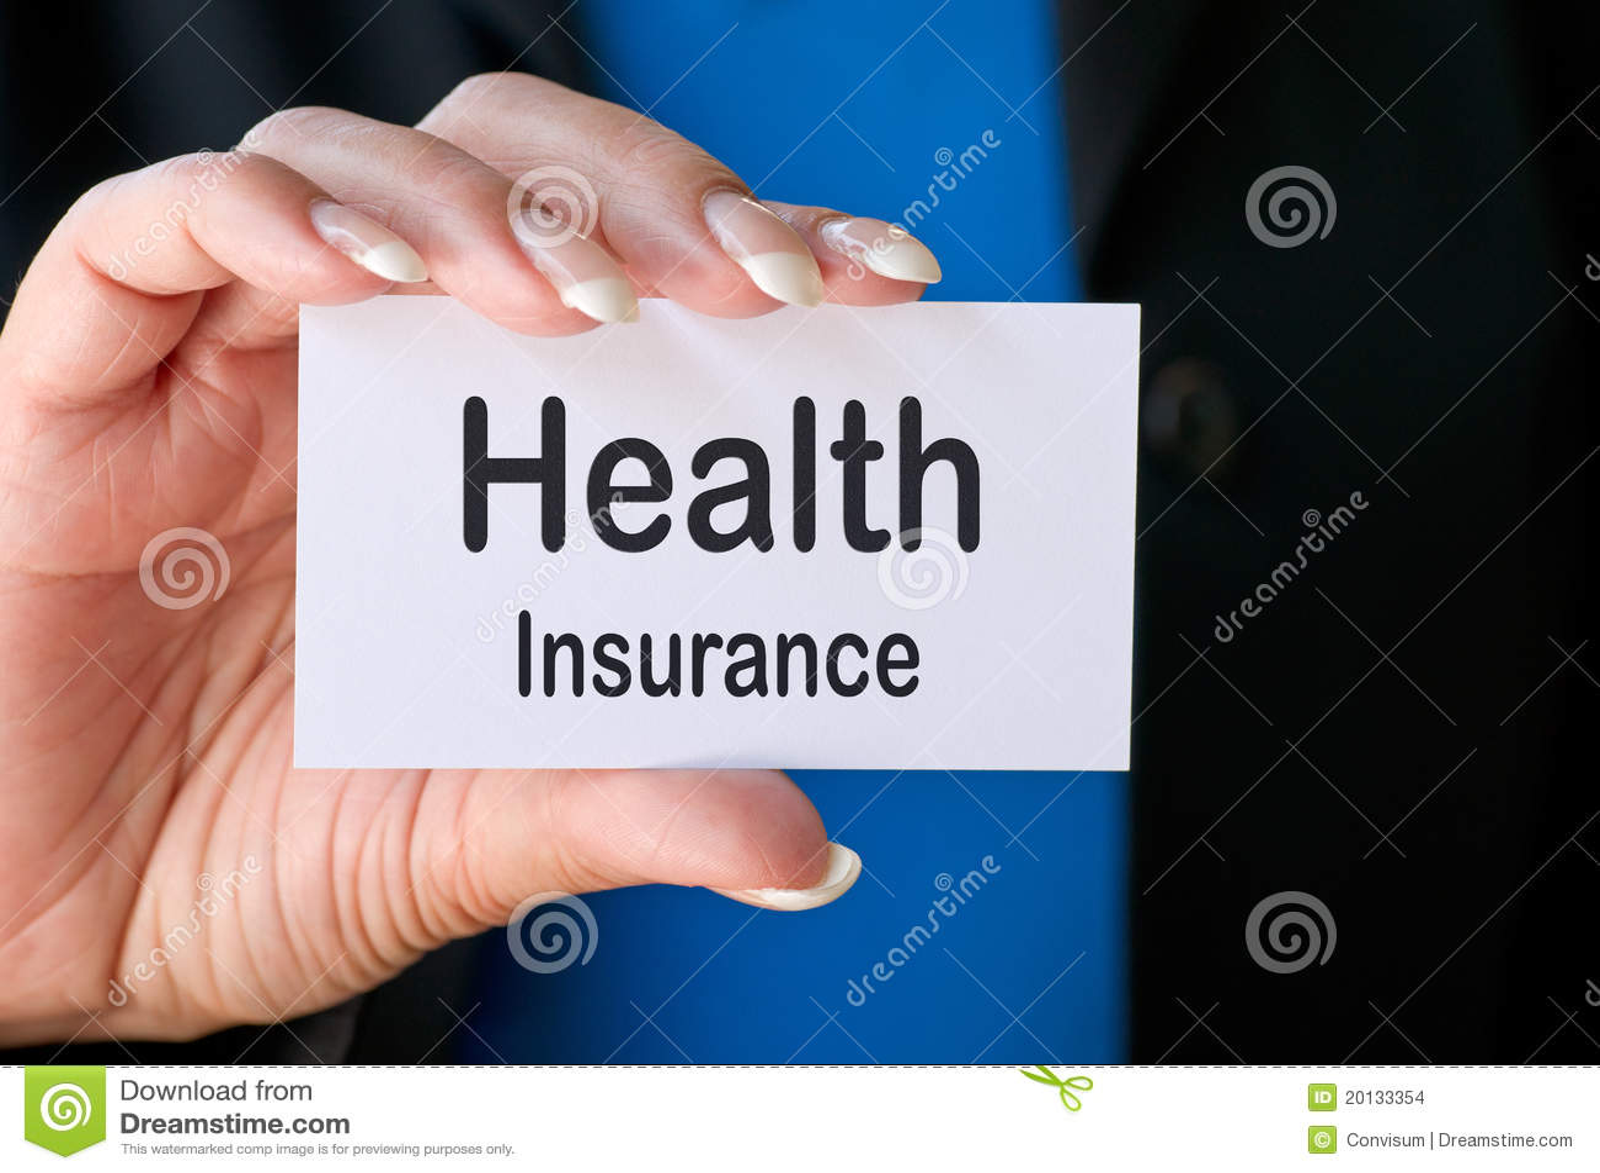 Health insurance business card stock photo image of businessperson health insurance business card royalty free stock photo reheart Choice Image